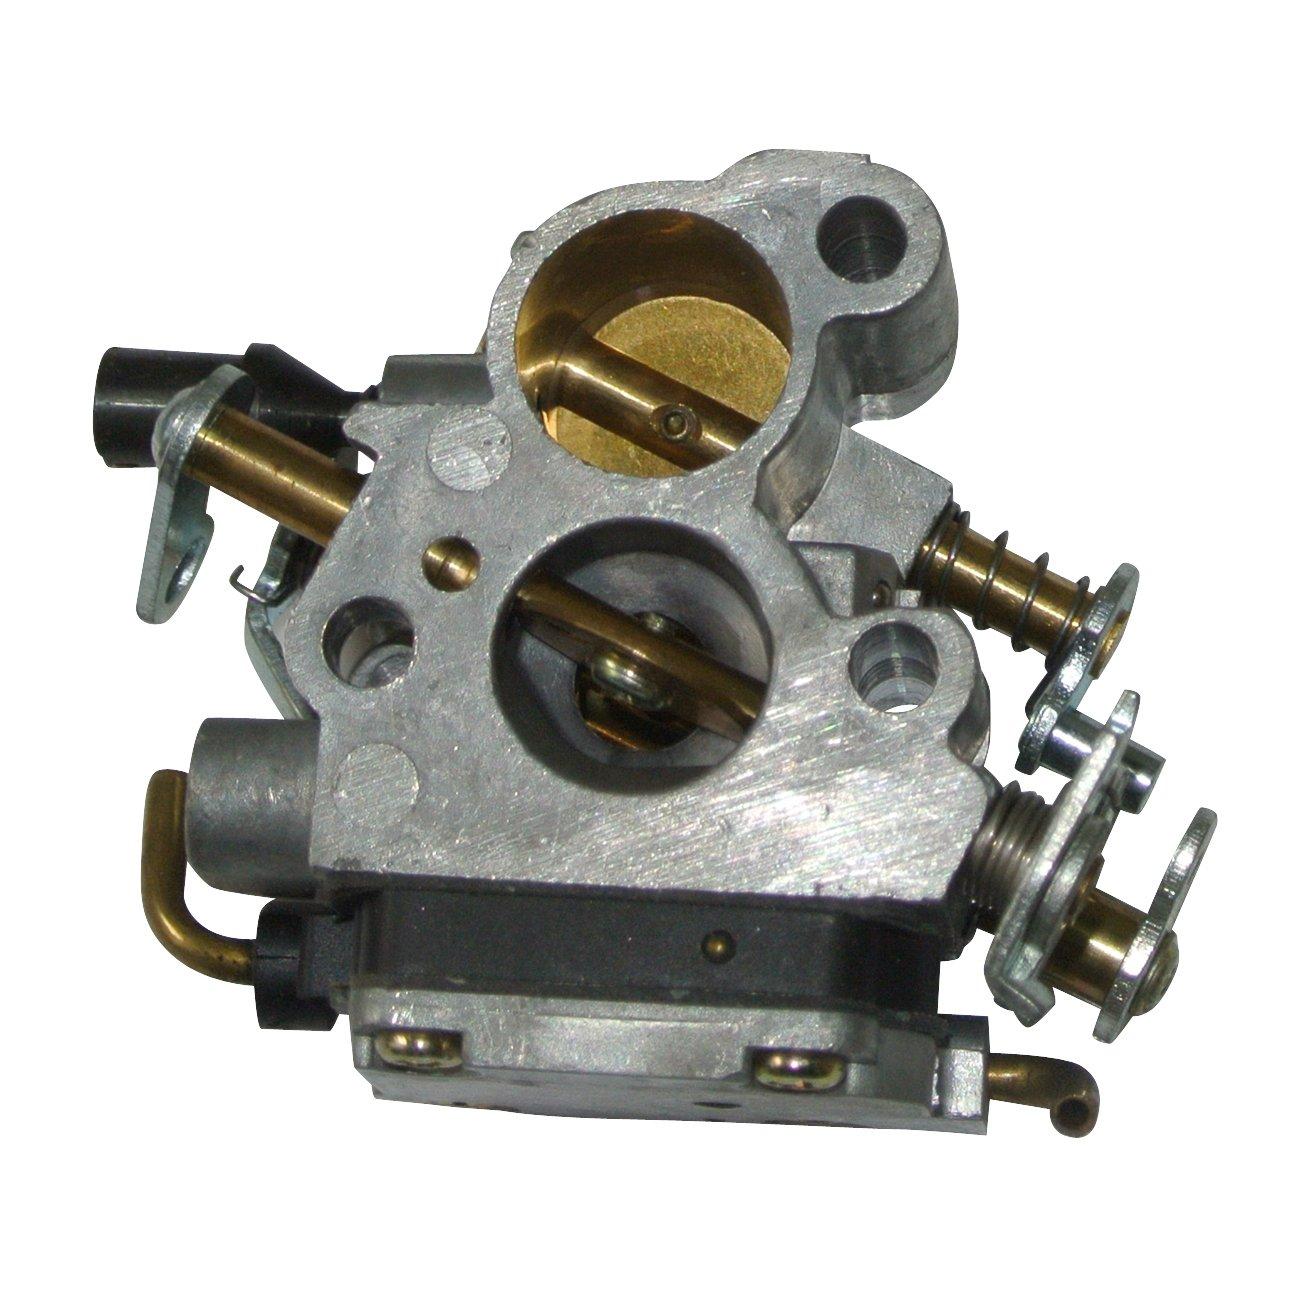 JRL 1pc Carburetor Carb Suitable for Husqvarna 240E 240 236E 236 235E 235 Carby